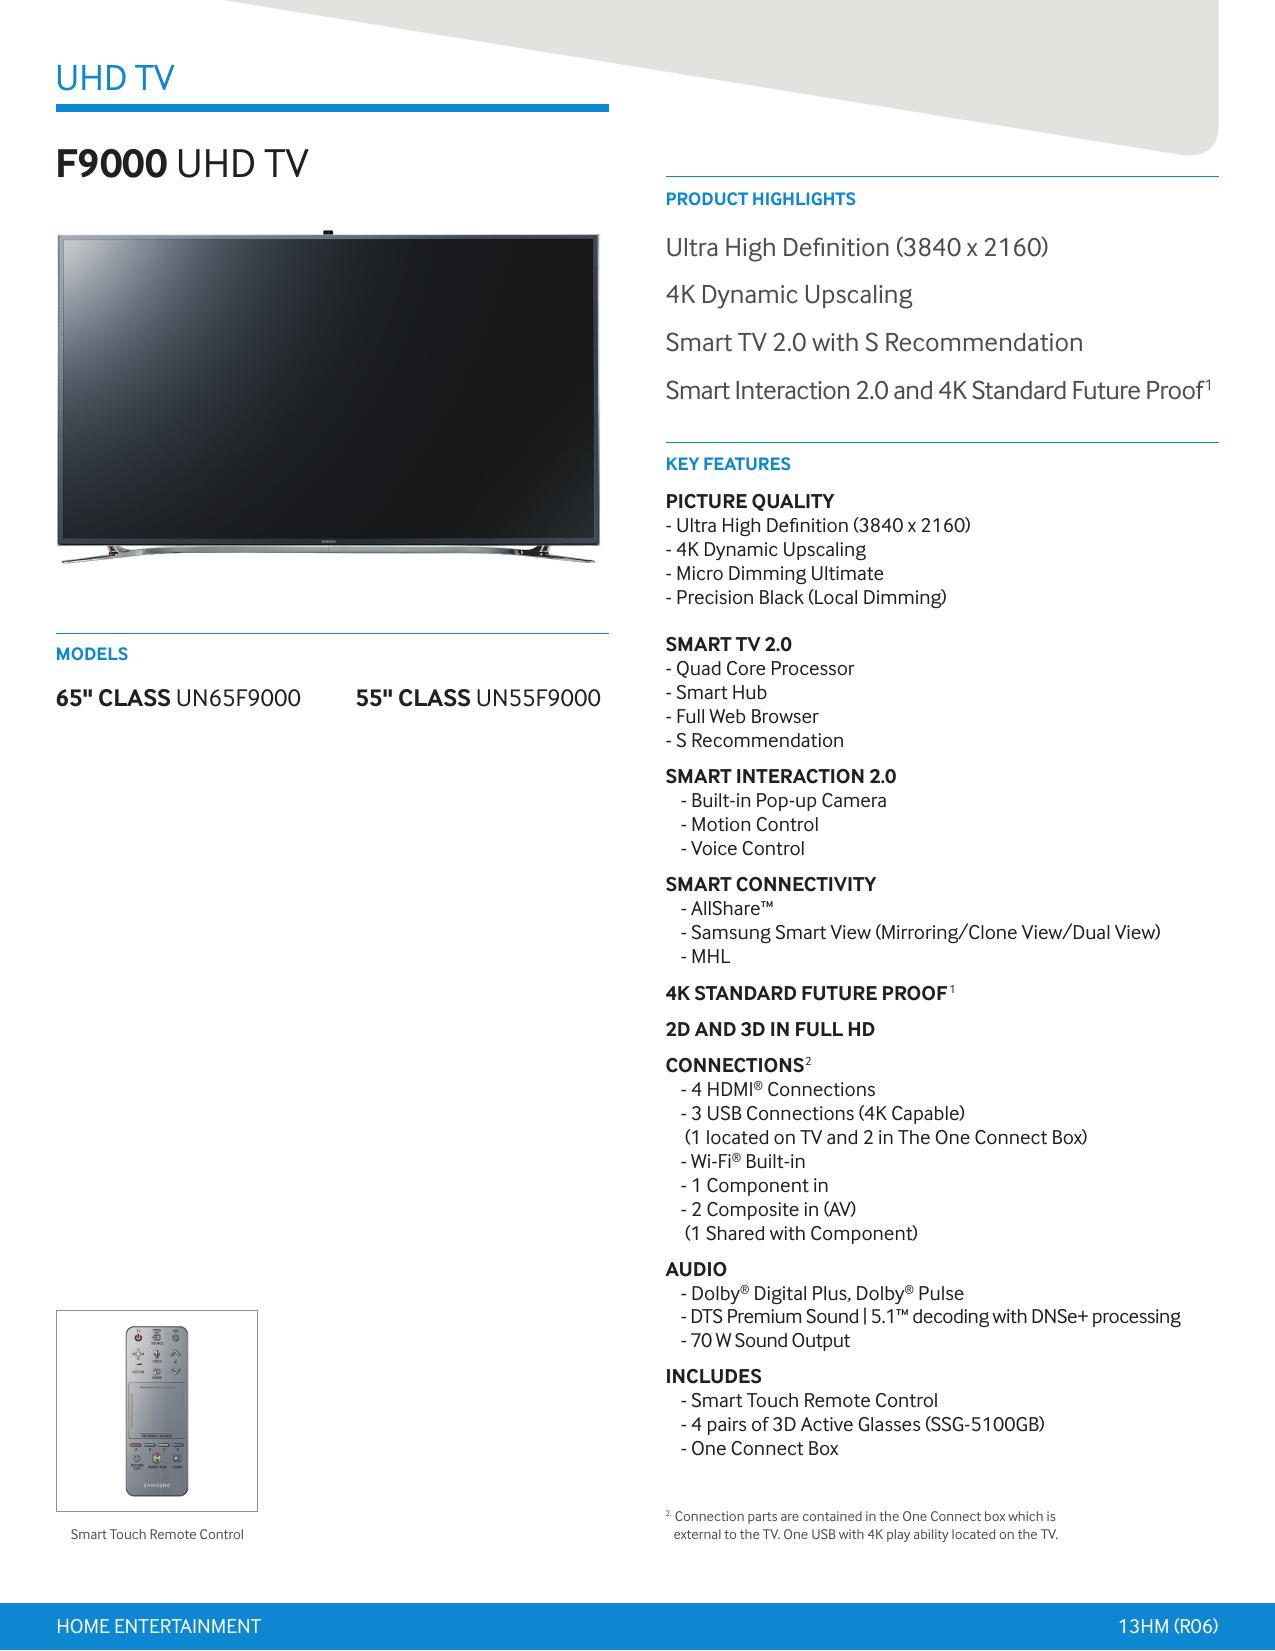 F9000 UHD TV | manualzz com